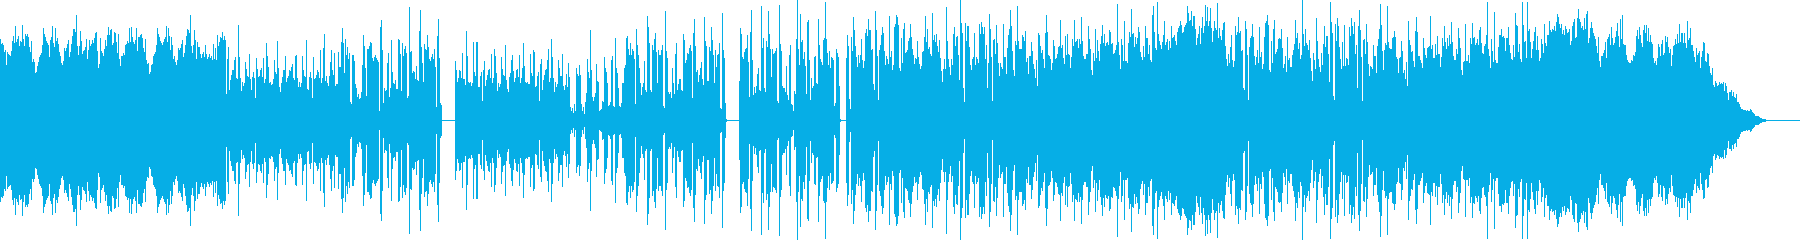 FM音源風フィールド系BGMの再生済みの波形